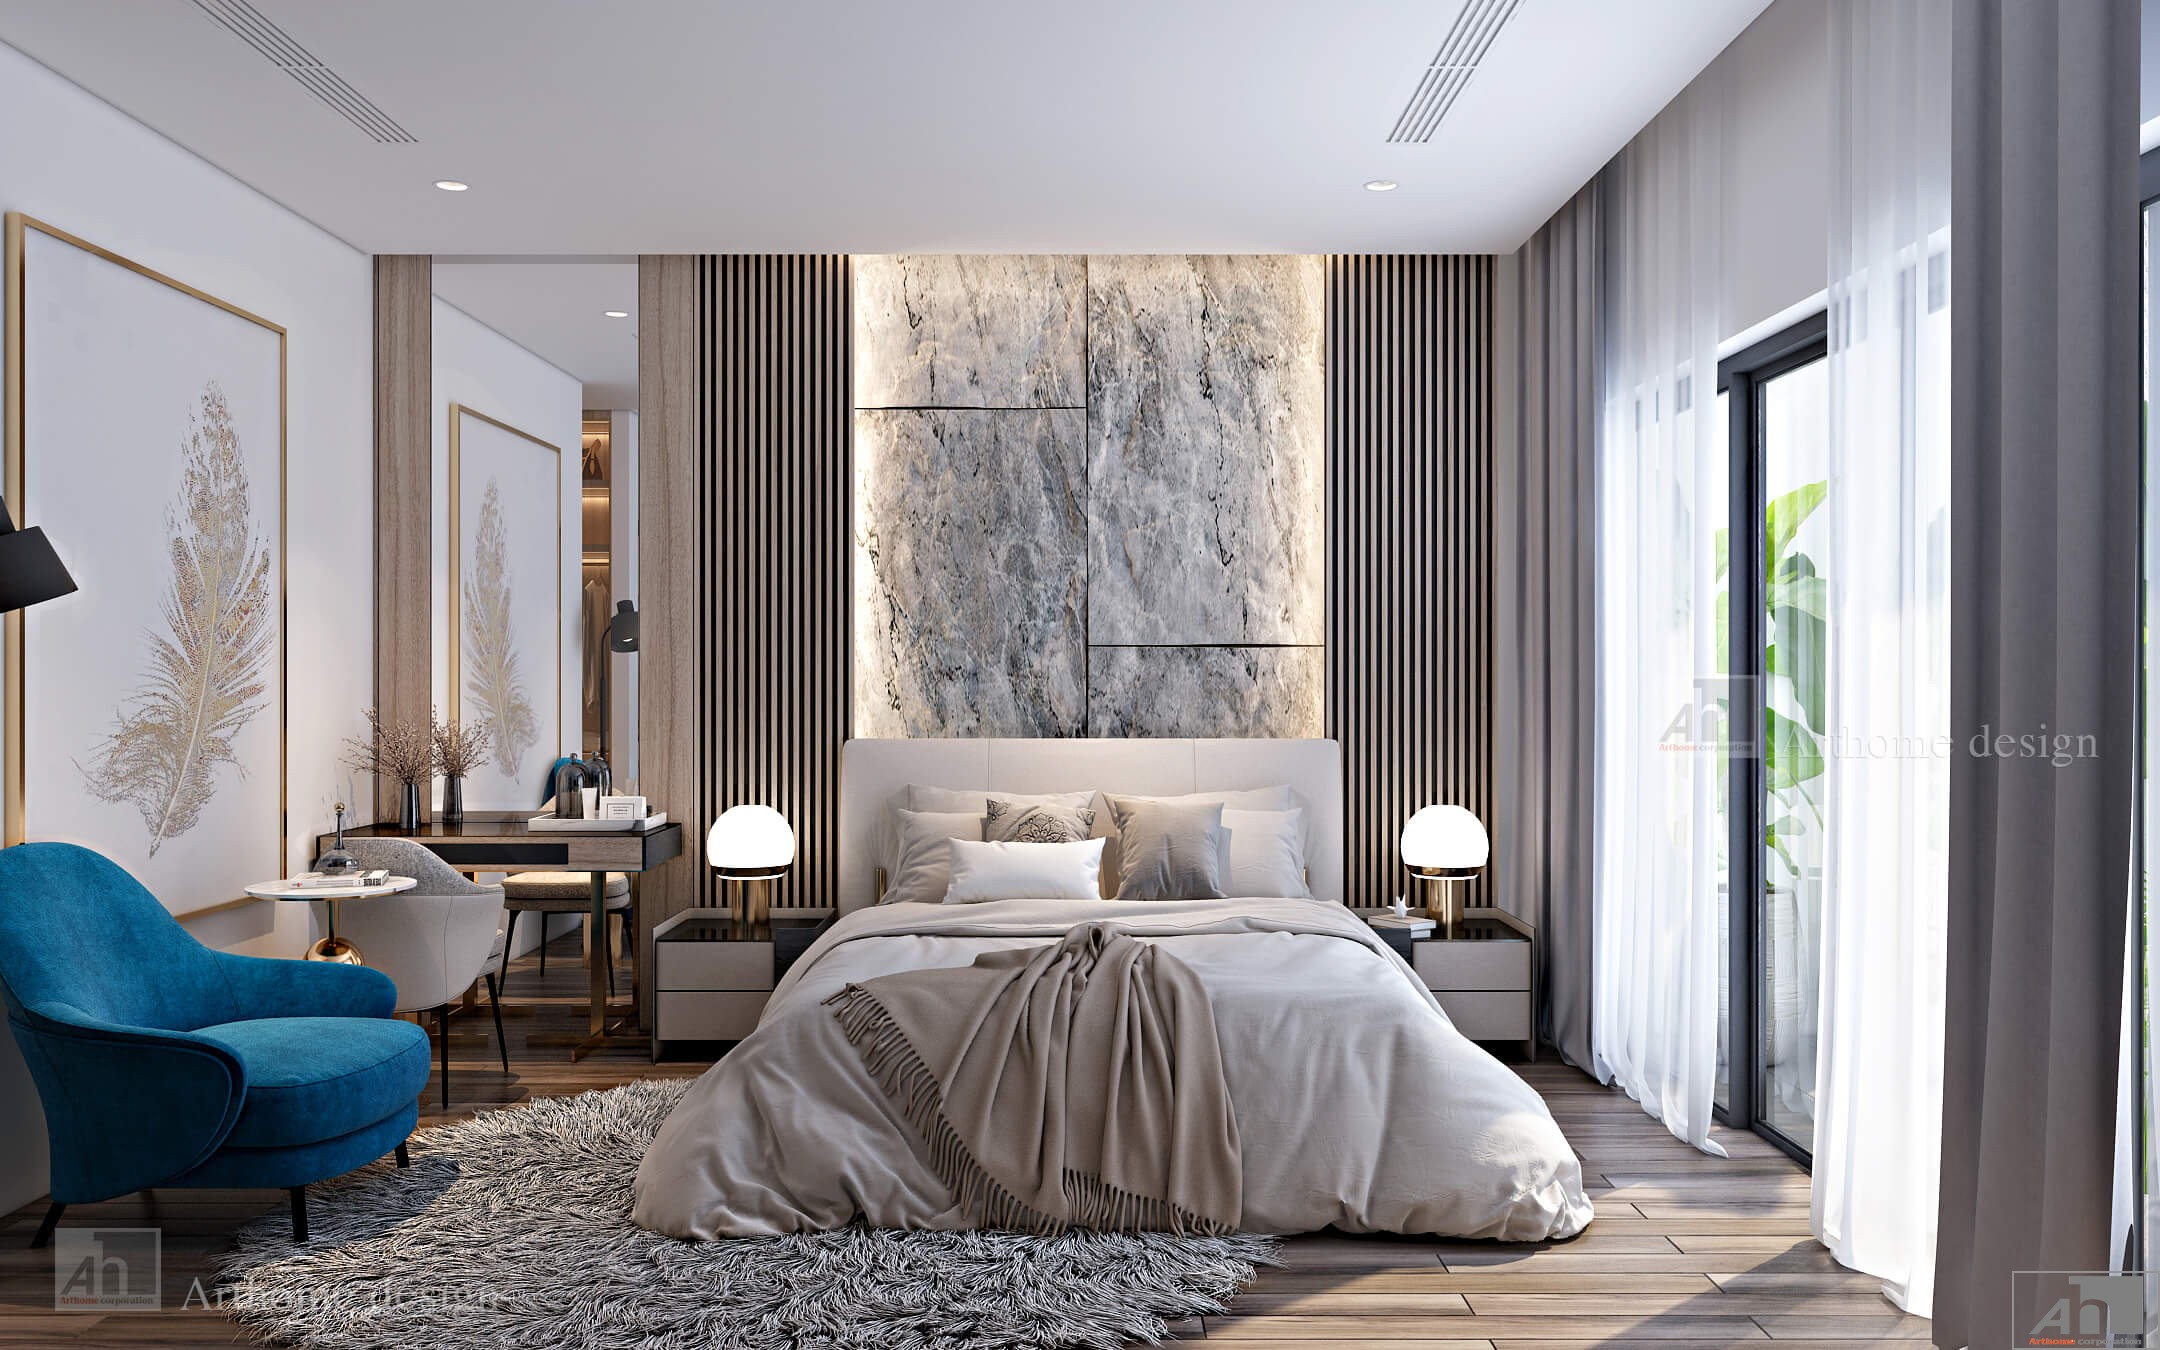 thiết kế nội thất căn hộ cao cấp MIDTOWN THE PEAK